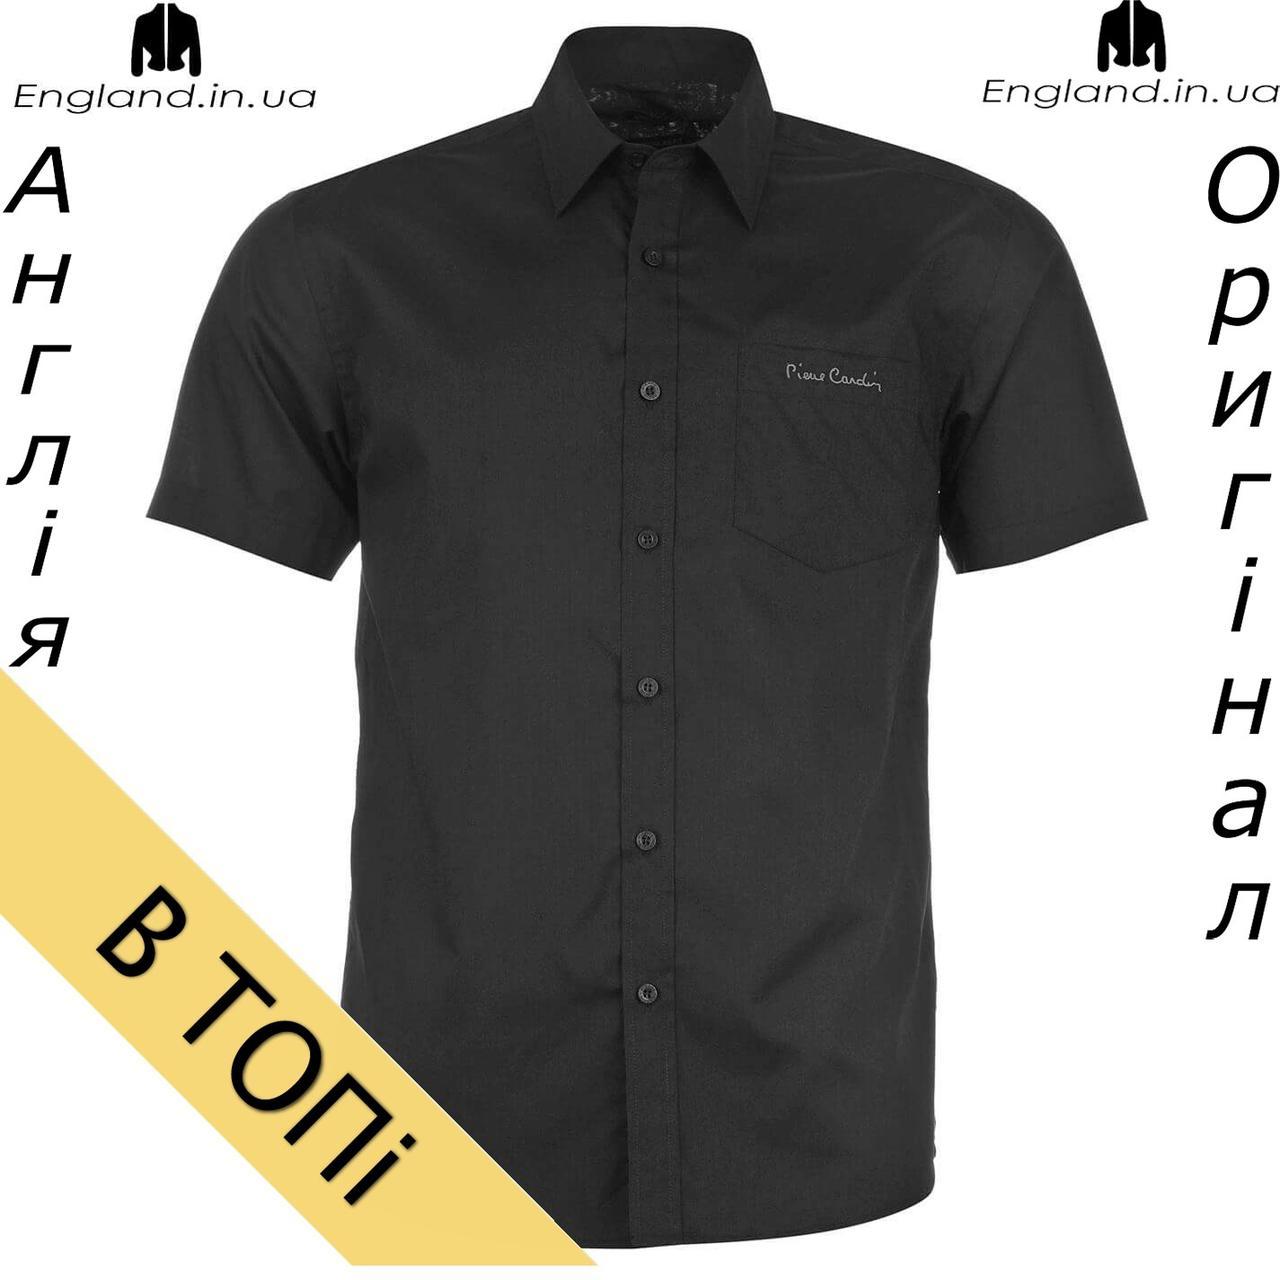 Рубашка мужская Pierre Cardin черная на короткий рукав